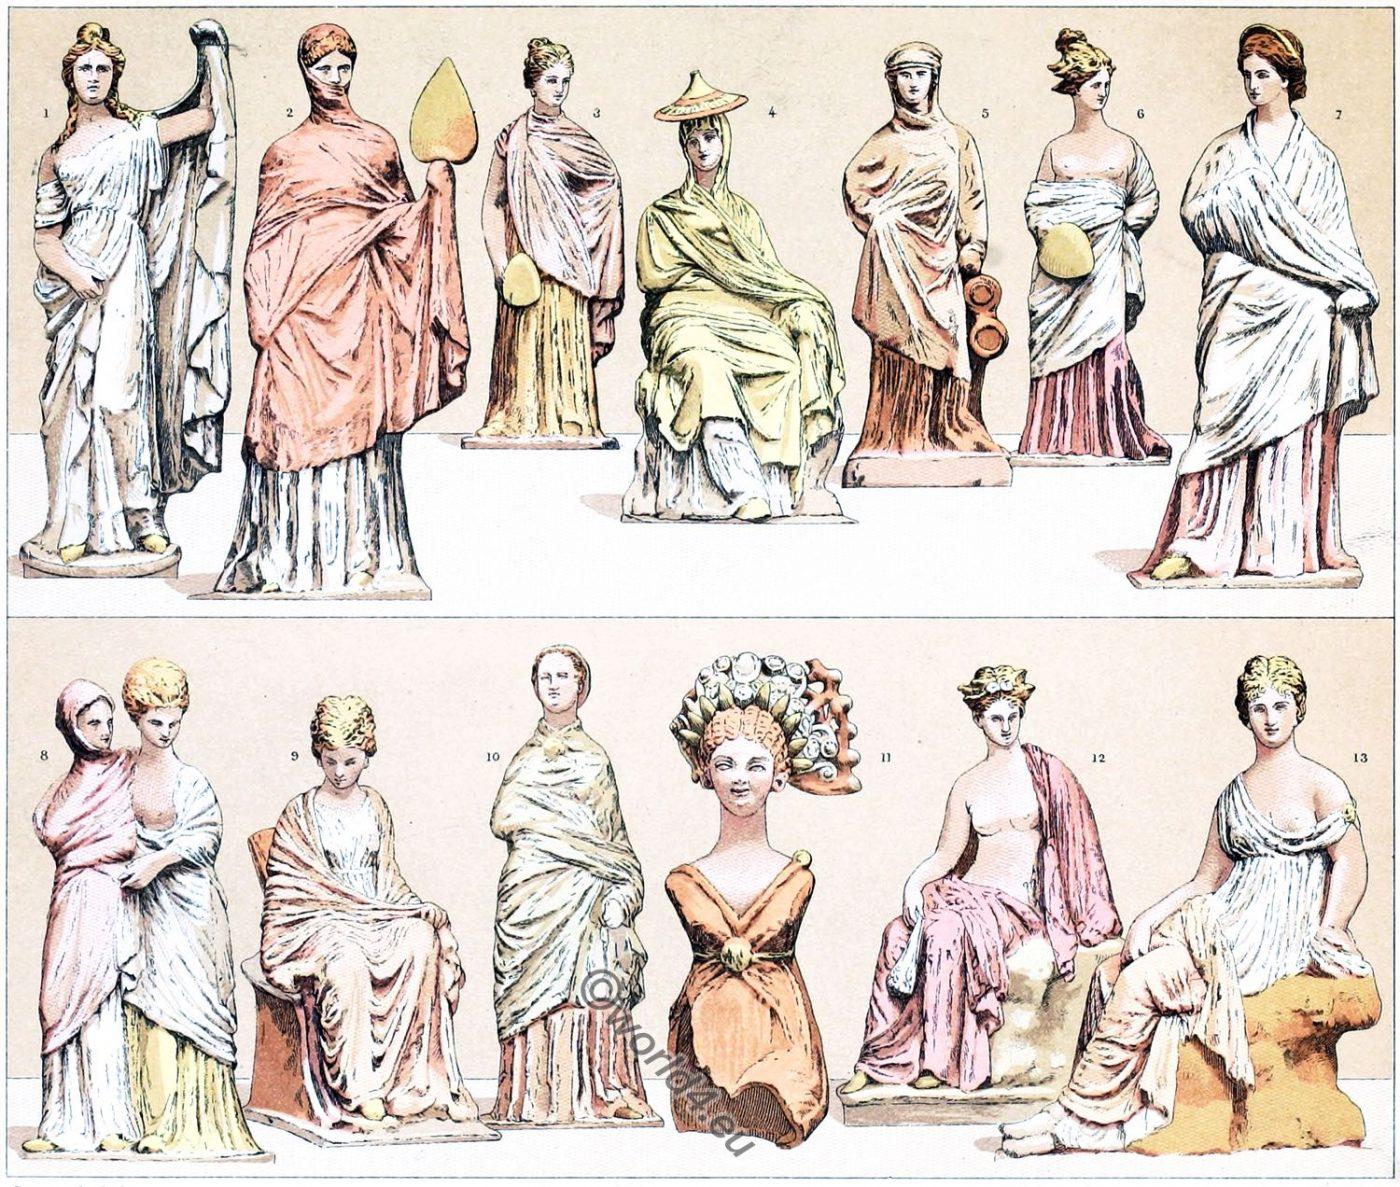 Greece, Tanagra, terracotta, figures, costumes, fashion